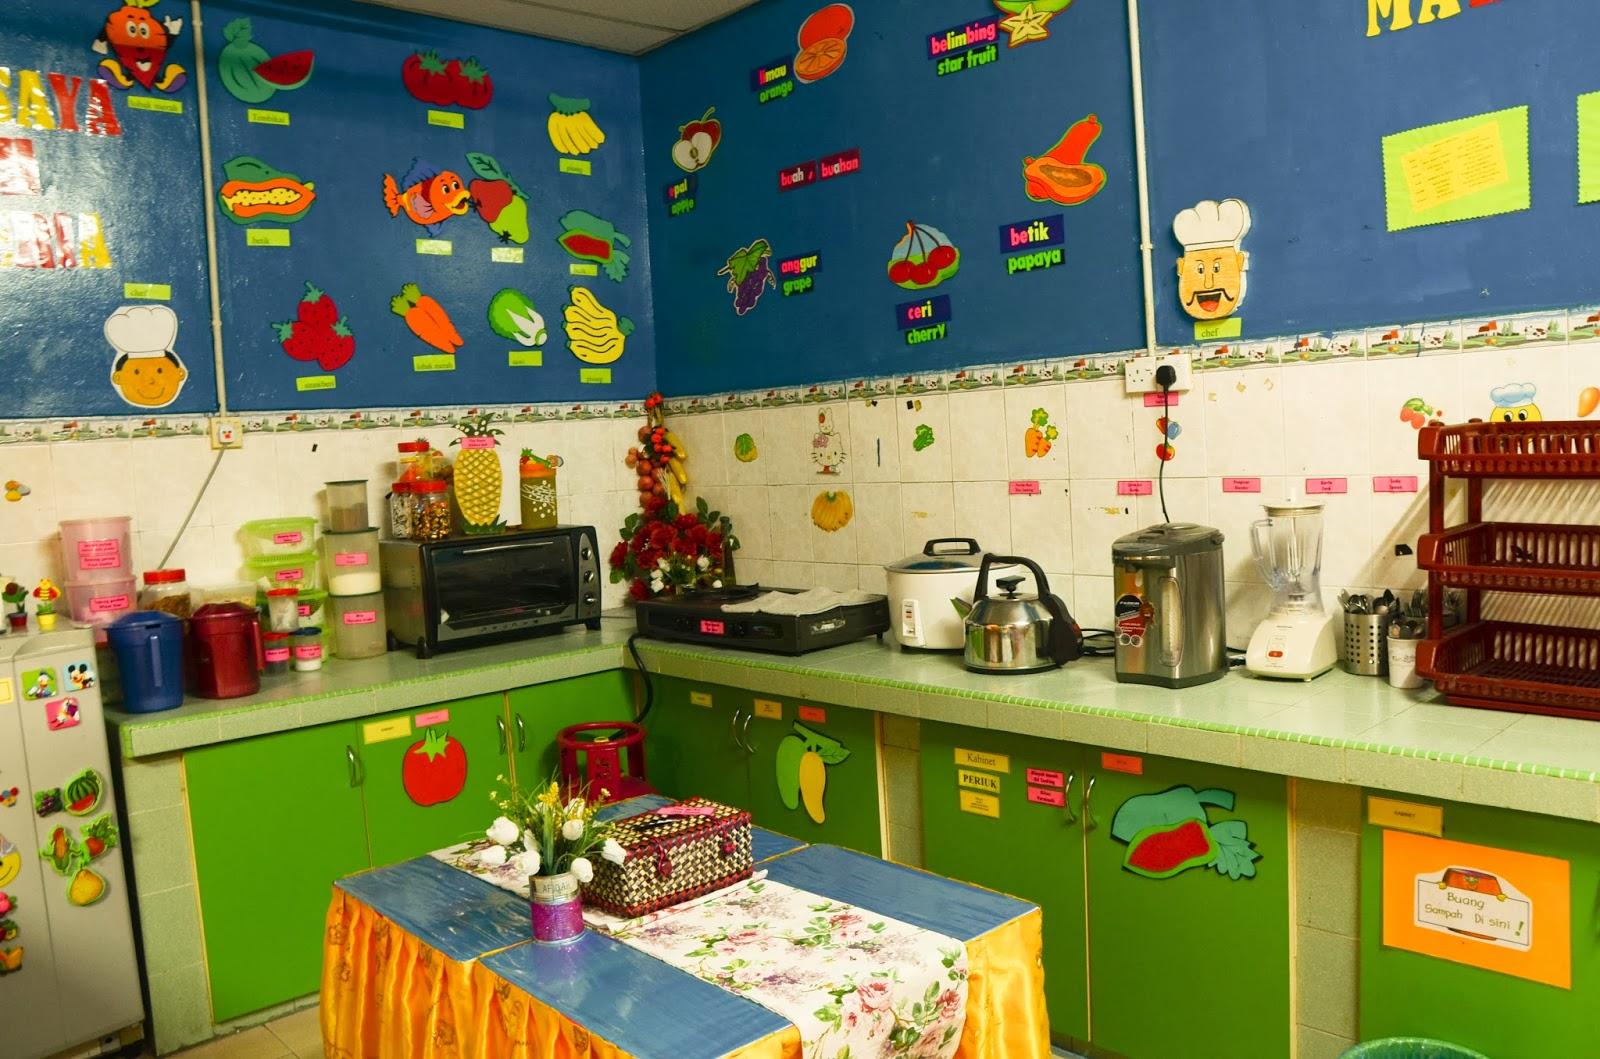 Hiasan Ruang Dapur Tabika Desainrumahid